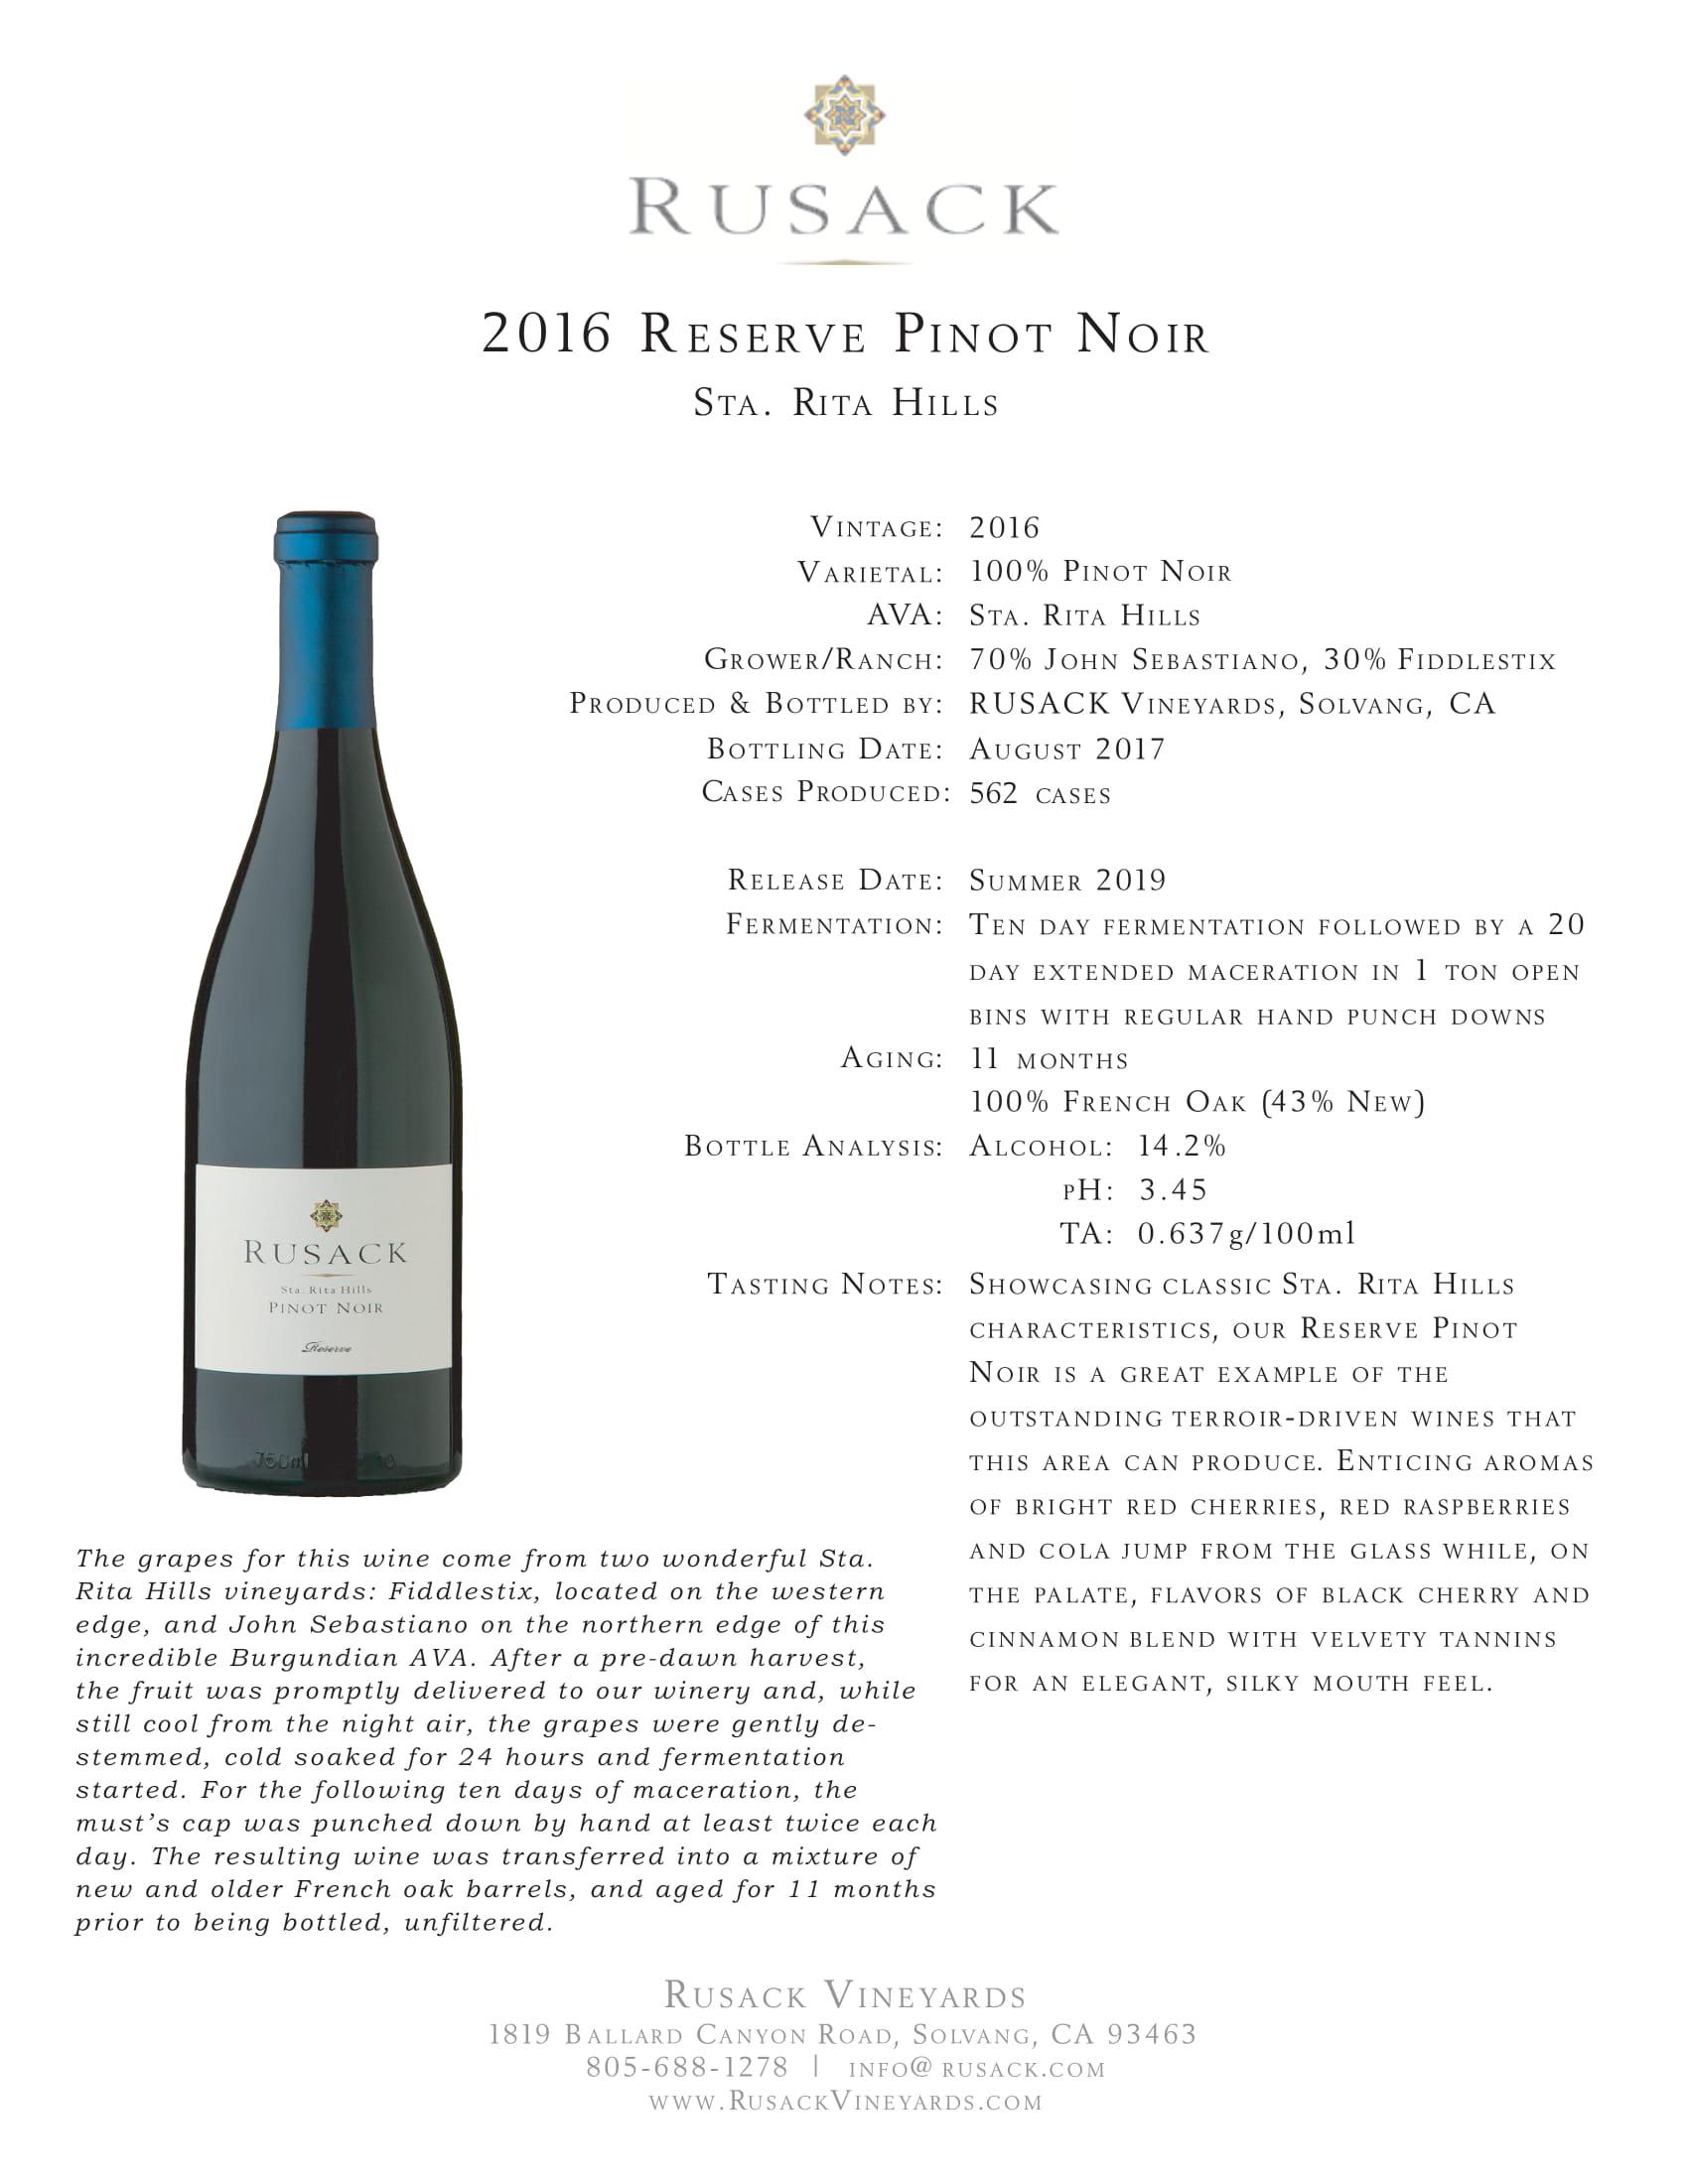 Rusack Vineyards Pinot Noir Santa Rita Hills Reserve Sell Sheet